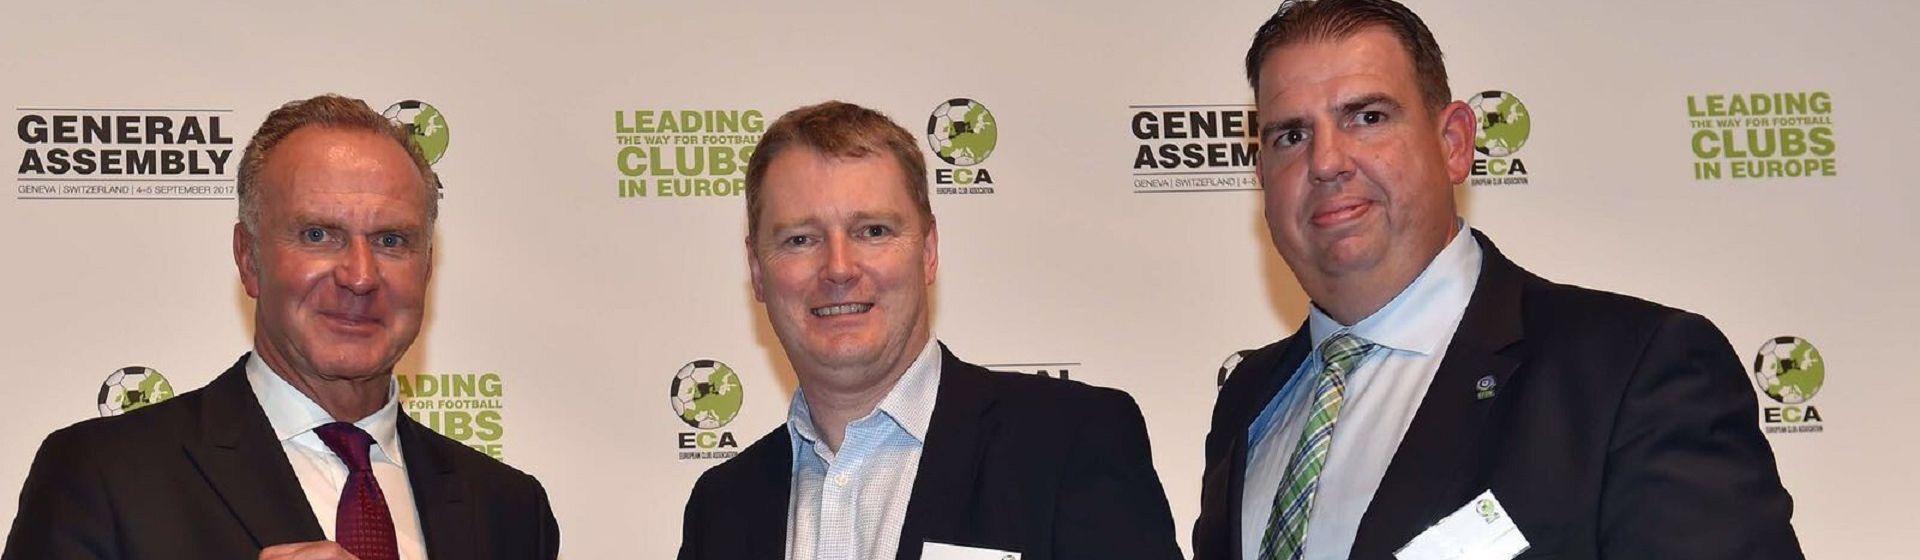 ECA CSR Award 2017